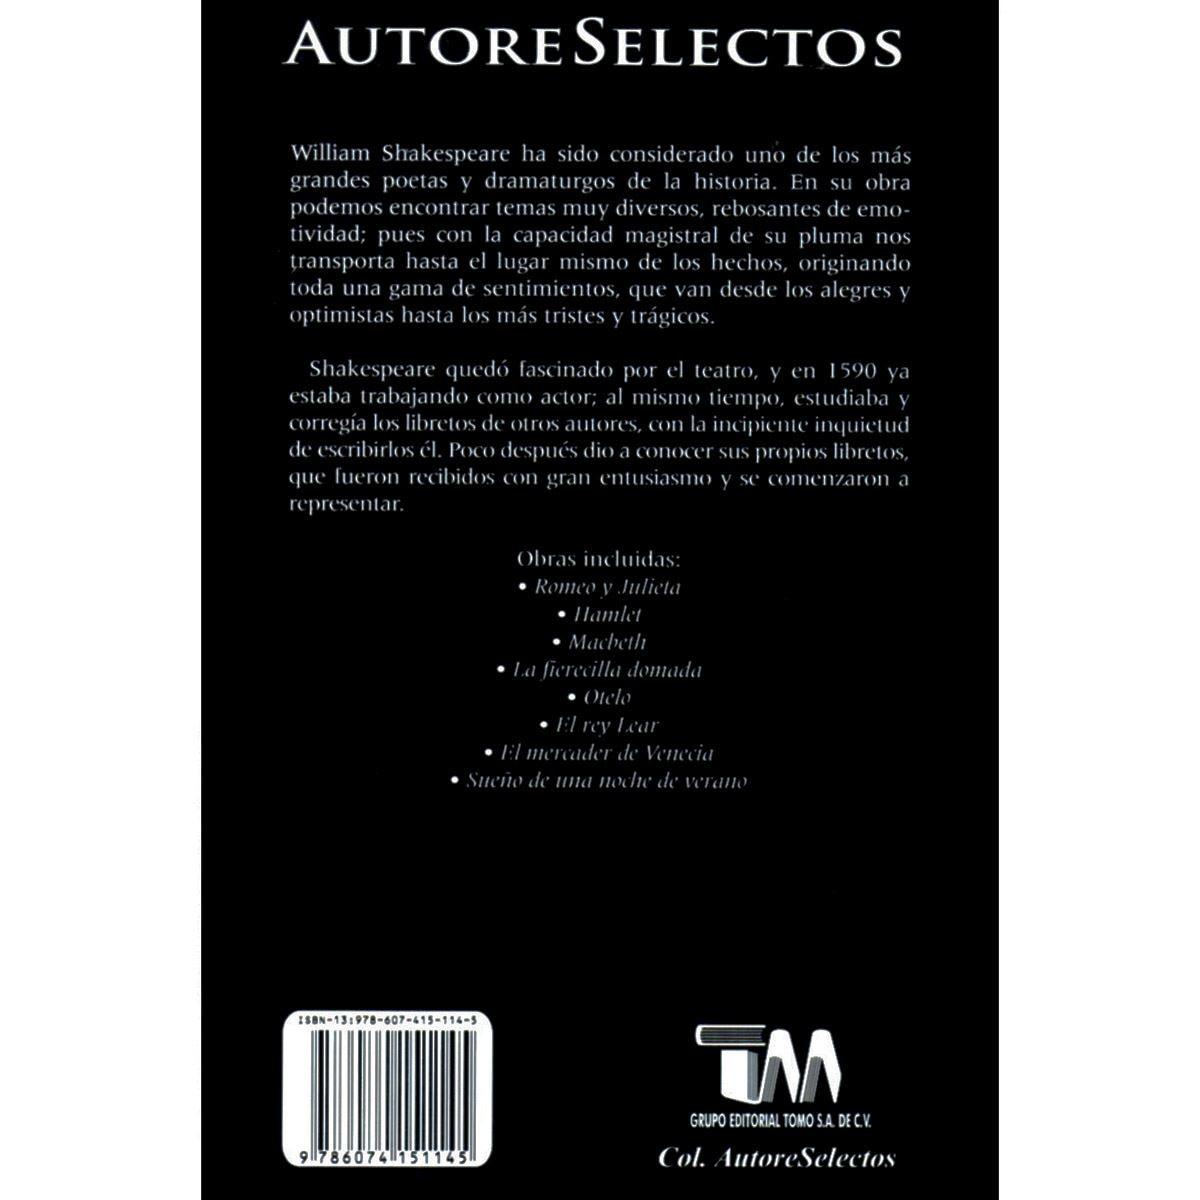 William shakespeare - autores selectos Libro - Sanborns